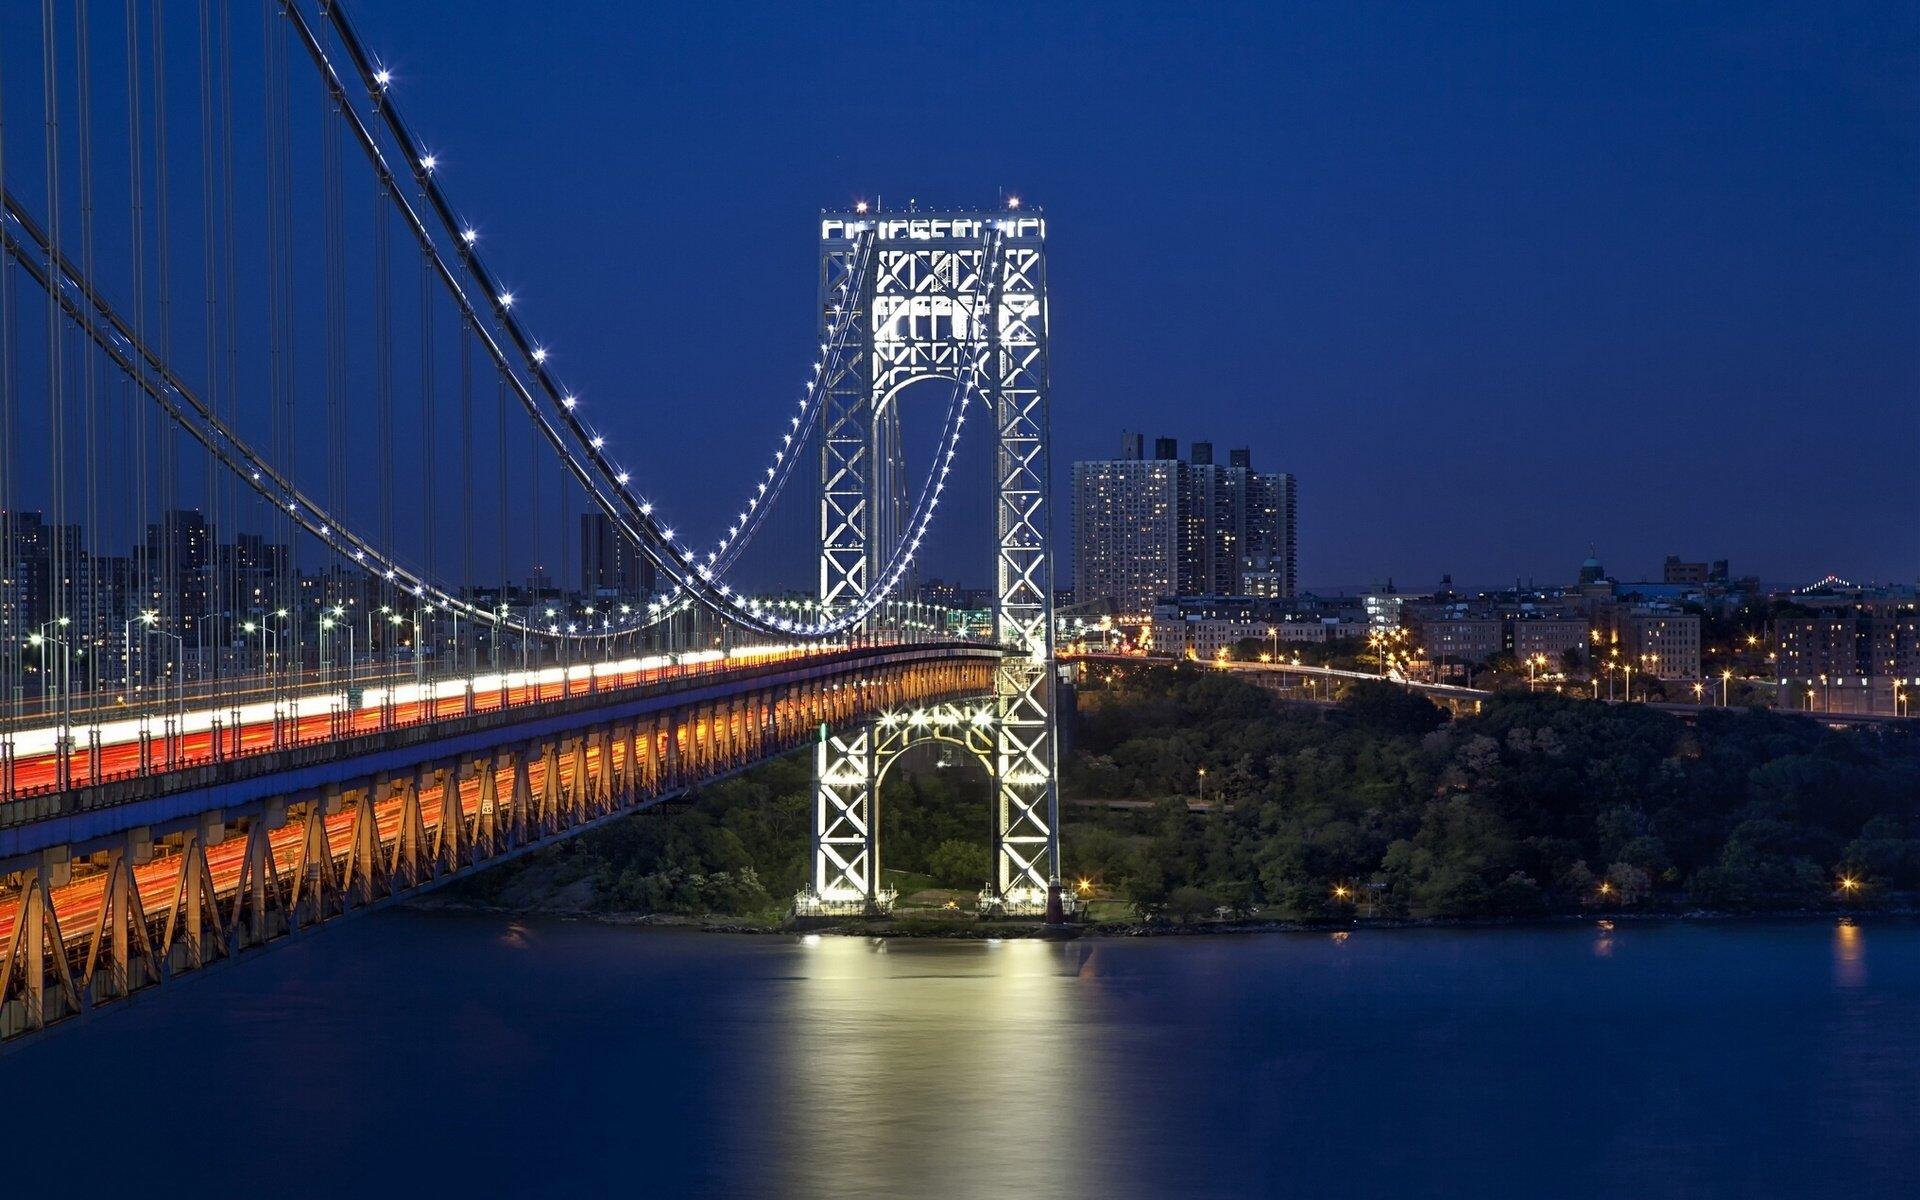 George Washington Bridge New York City wallpaper 1920x1200 1920x1200